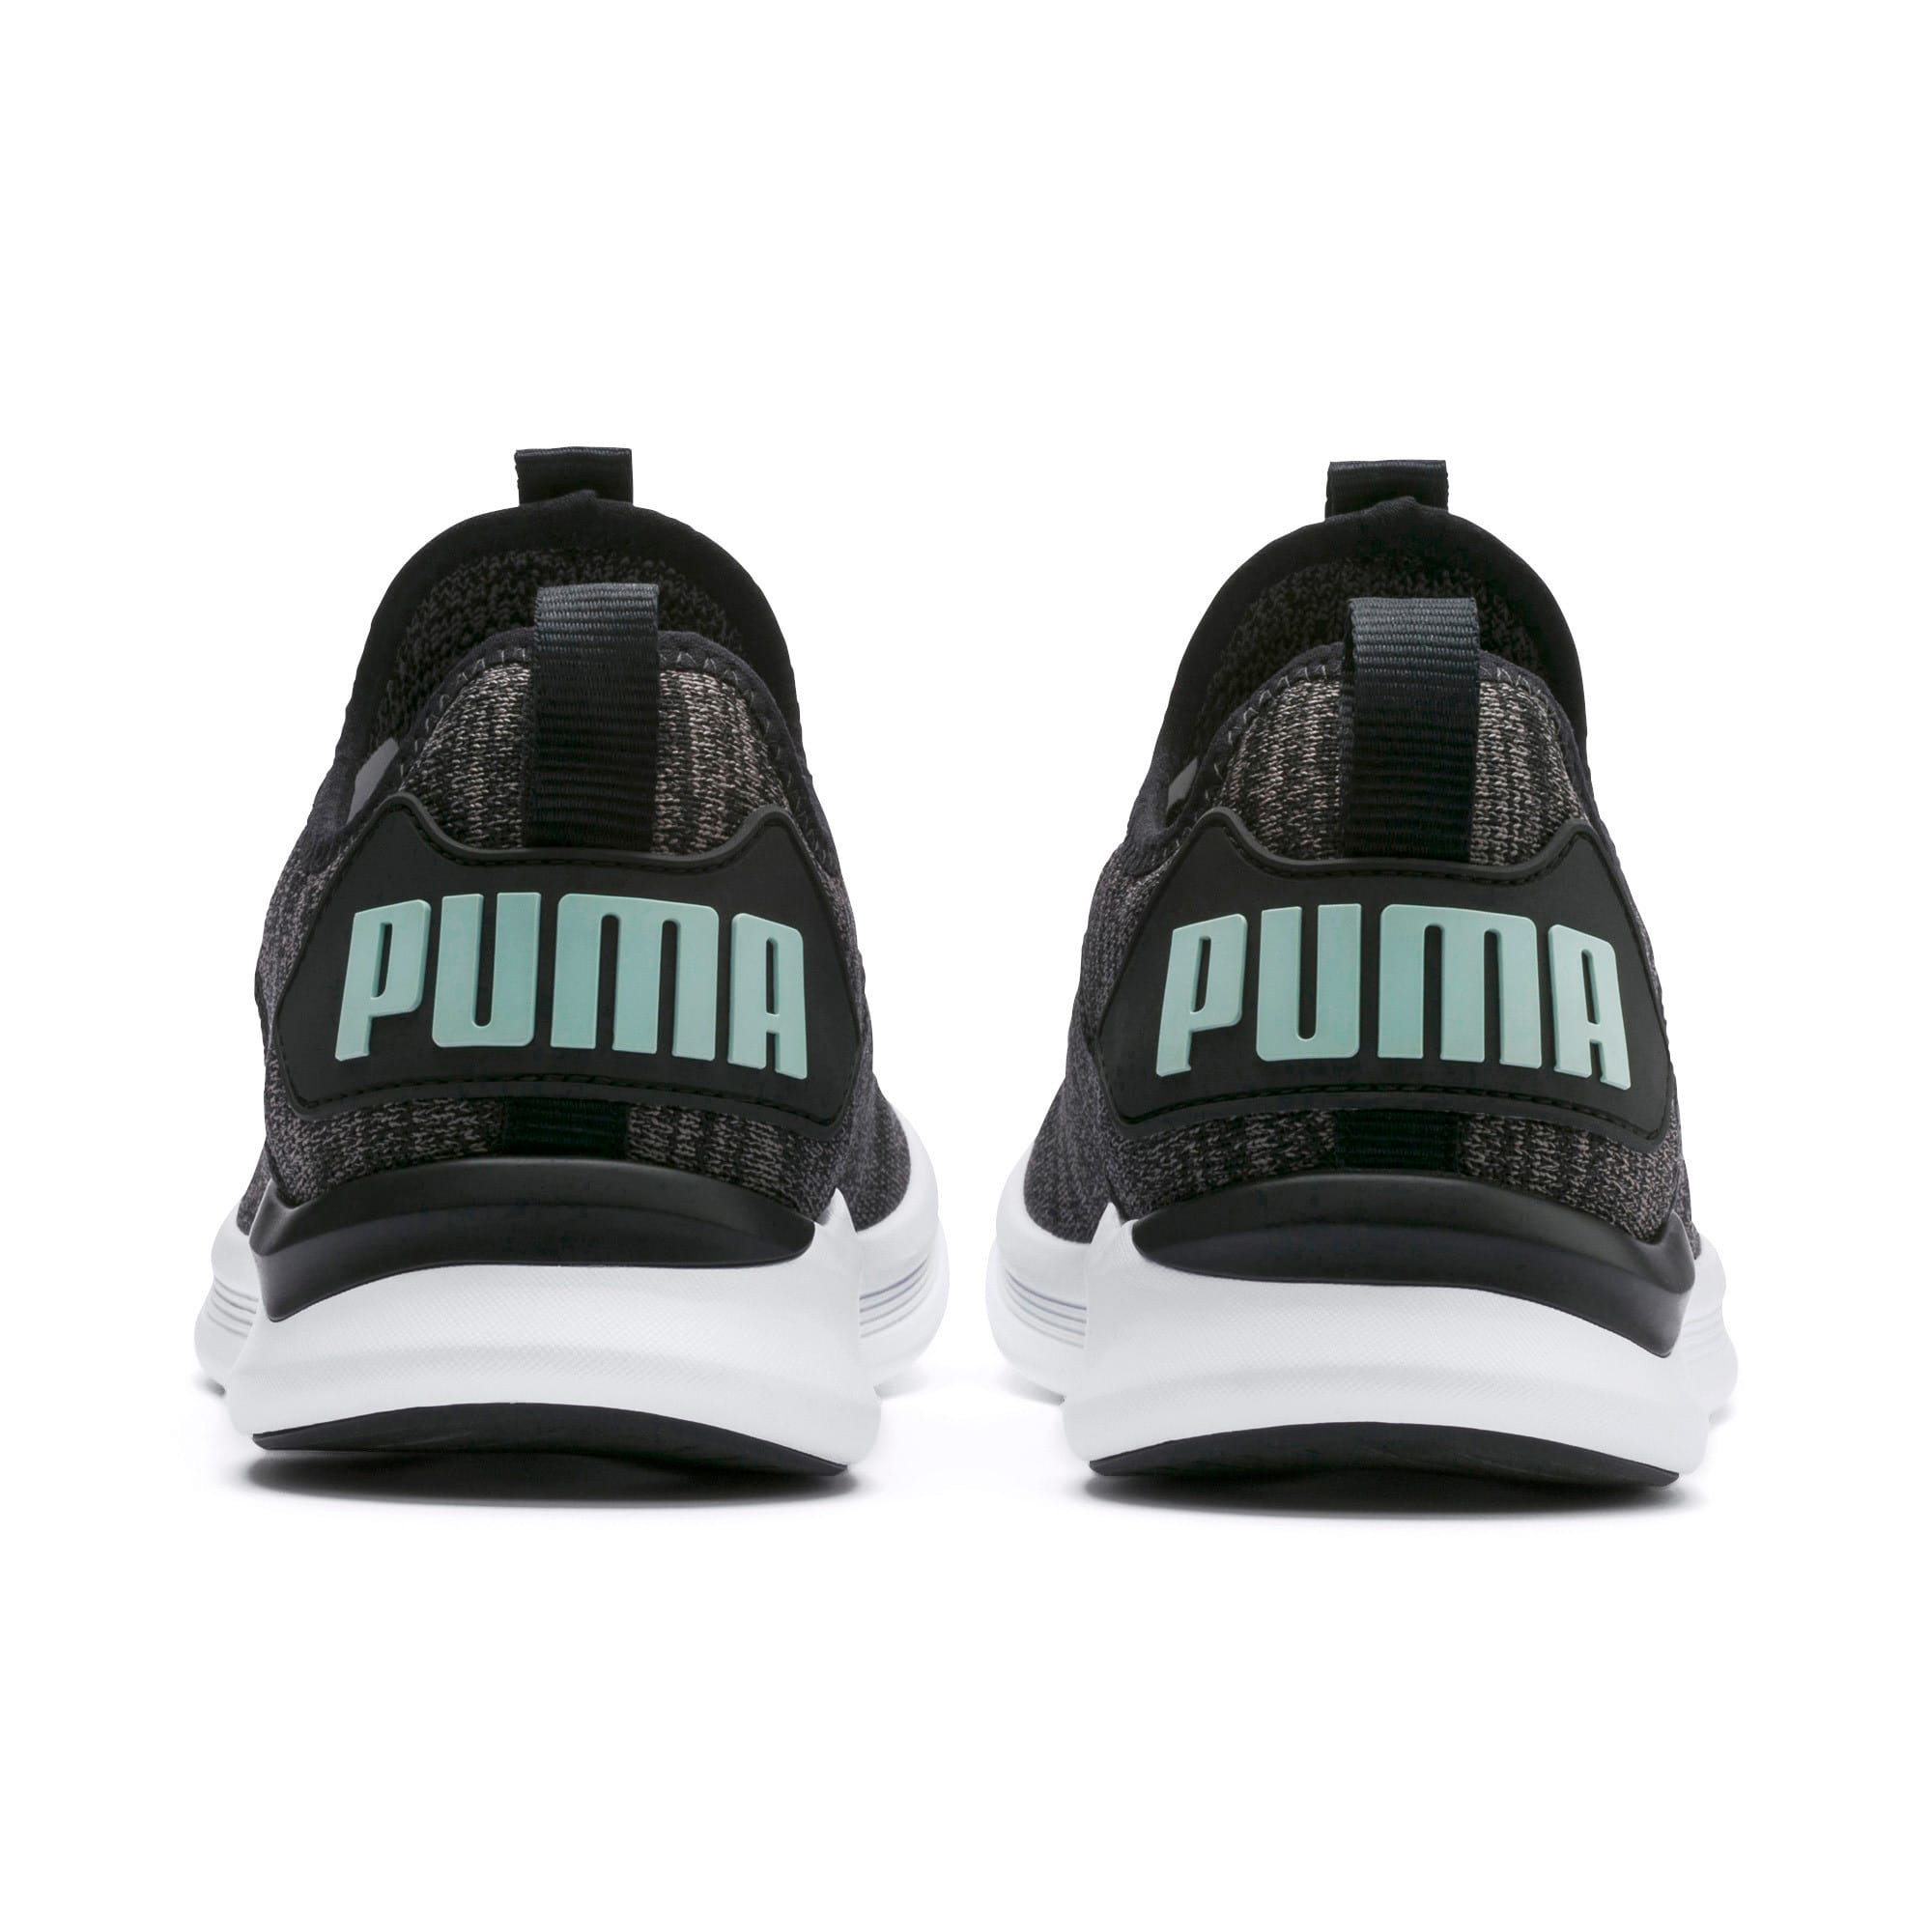 Thumbnail 4 of IGNITE Flash evoKNIT Women's Running Shoes, Black-Charcoal-Fair Aqua, medium